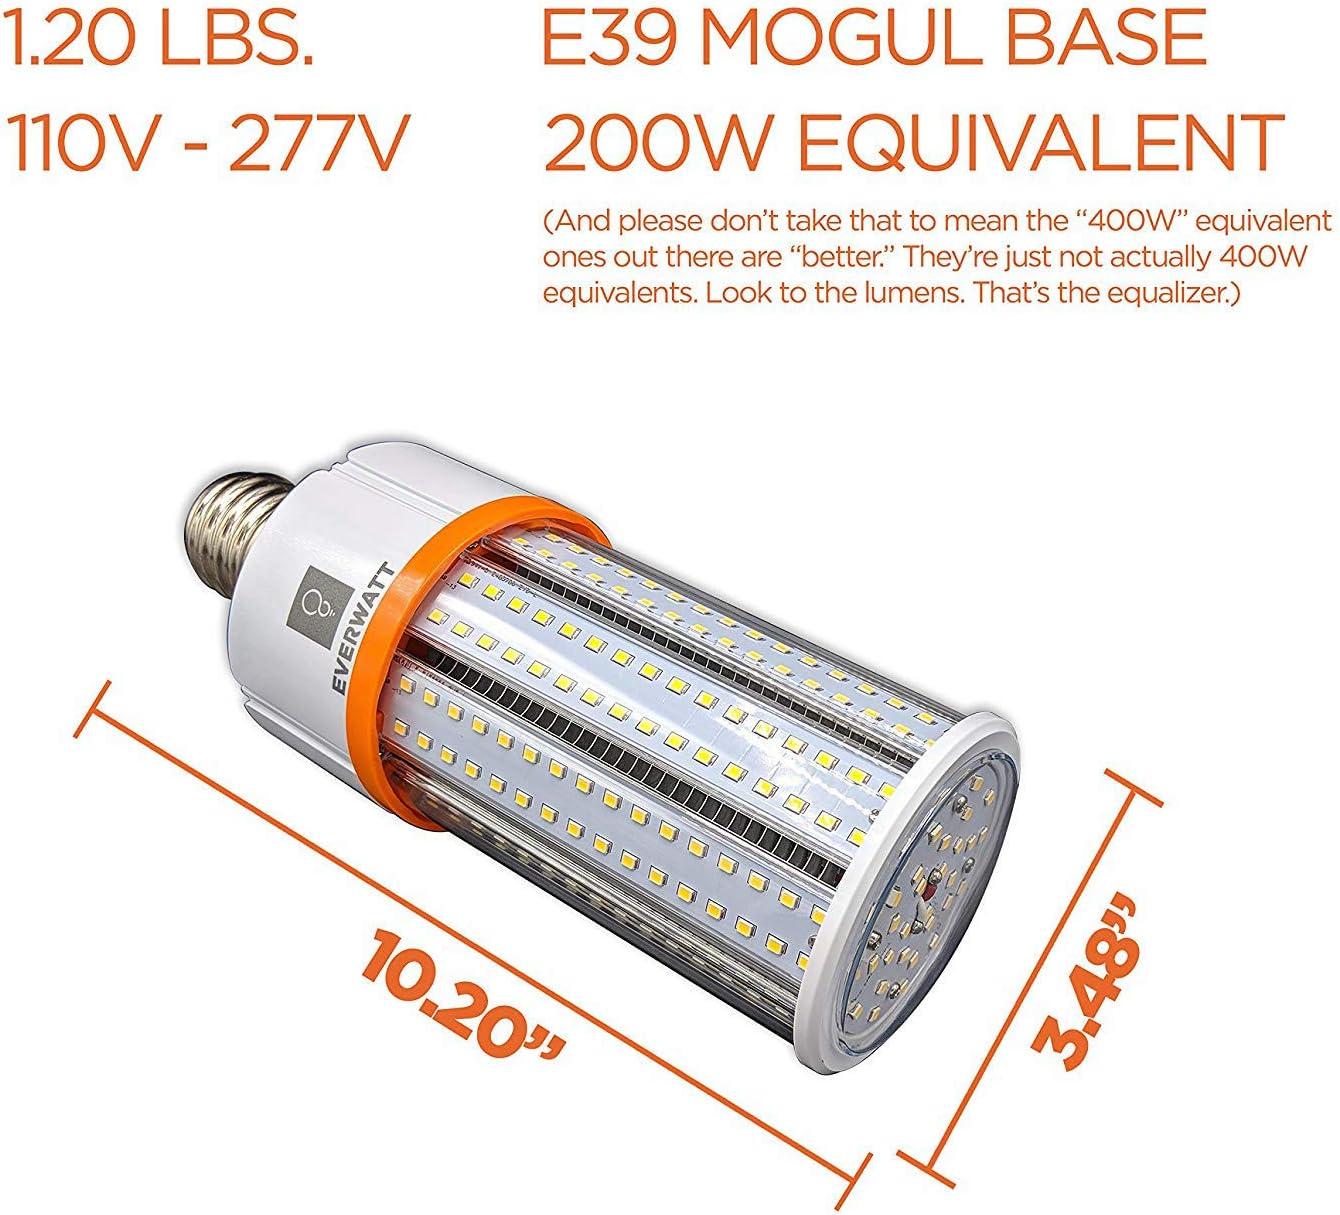 LED Corn Light Bulb IP64 Waterproof Replaces MH 14422 LMS HPS 5000K Indoor//Outdoor Area Light 100W HID Large Mogul E39 Base 400W Metal Halide Equiv CFL